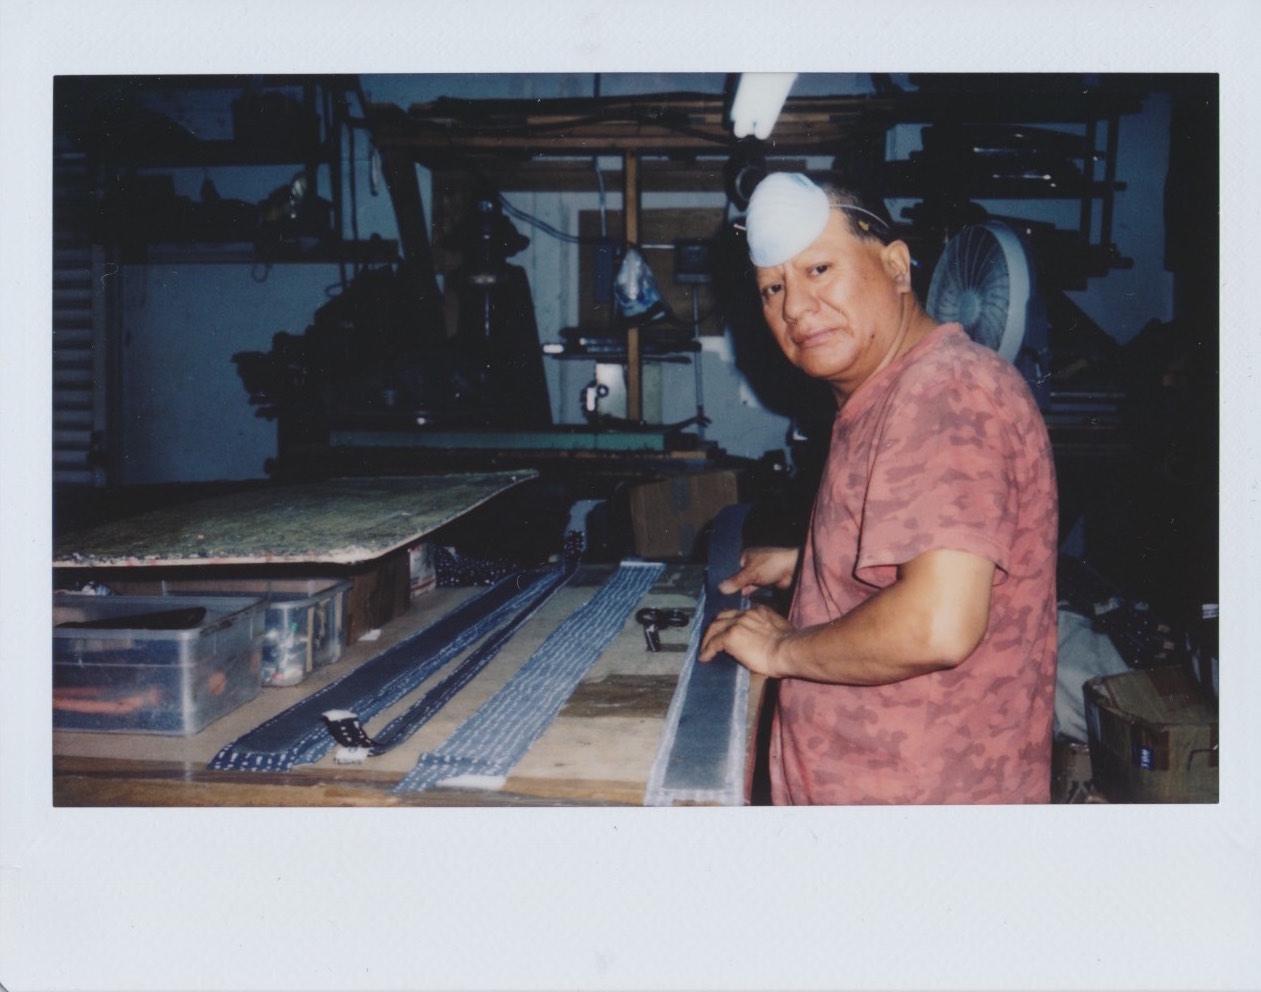 Photos taken in New York's Garment Center. Courtesy of the author.